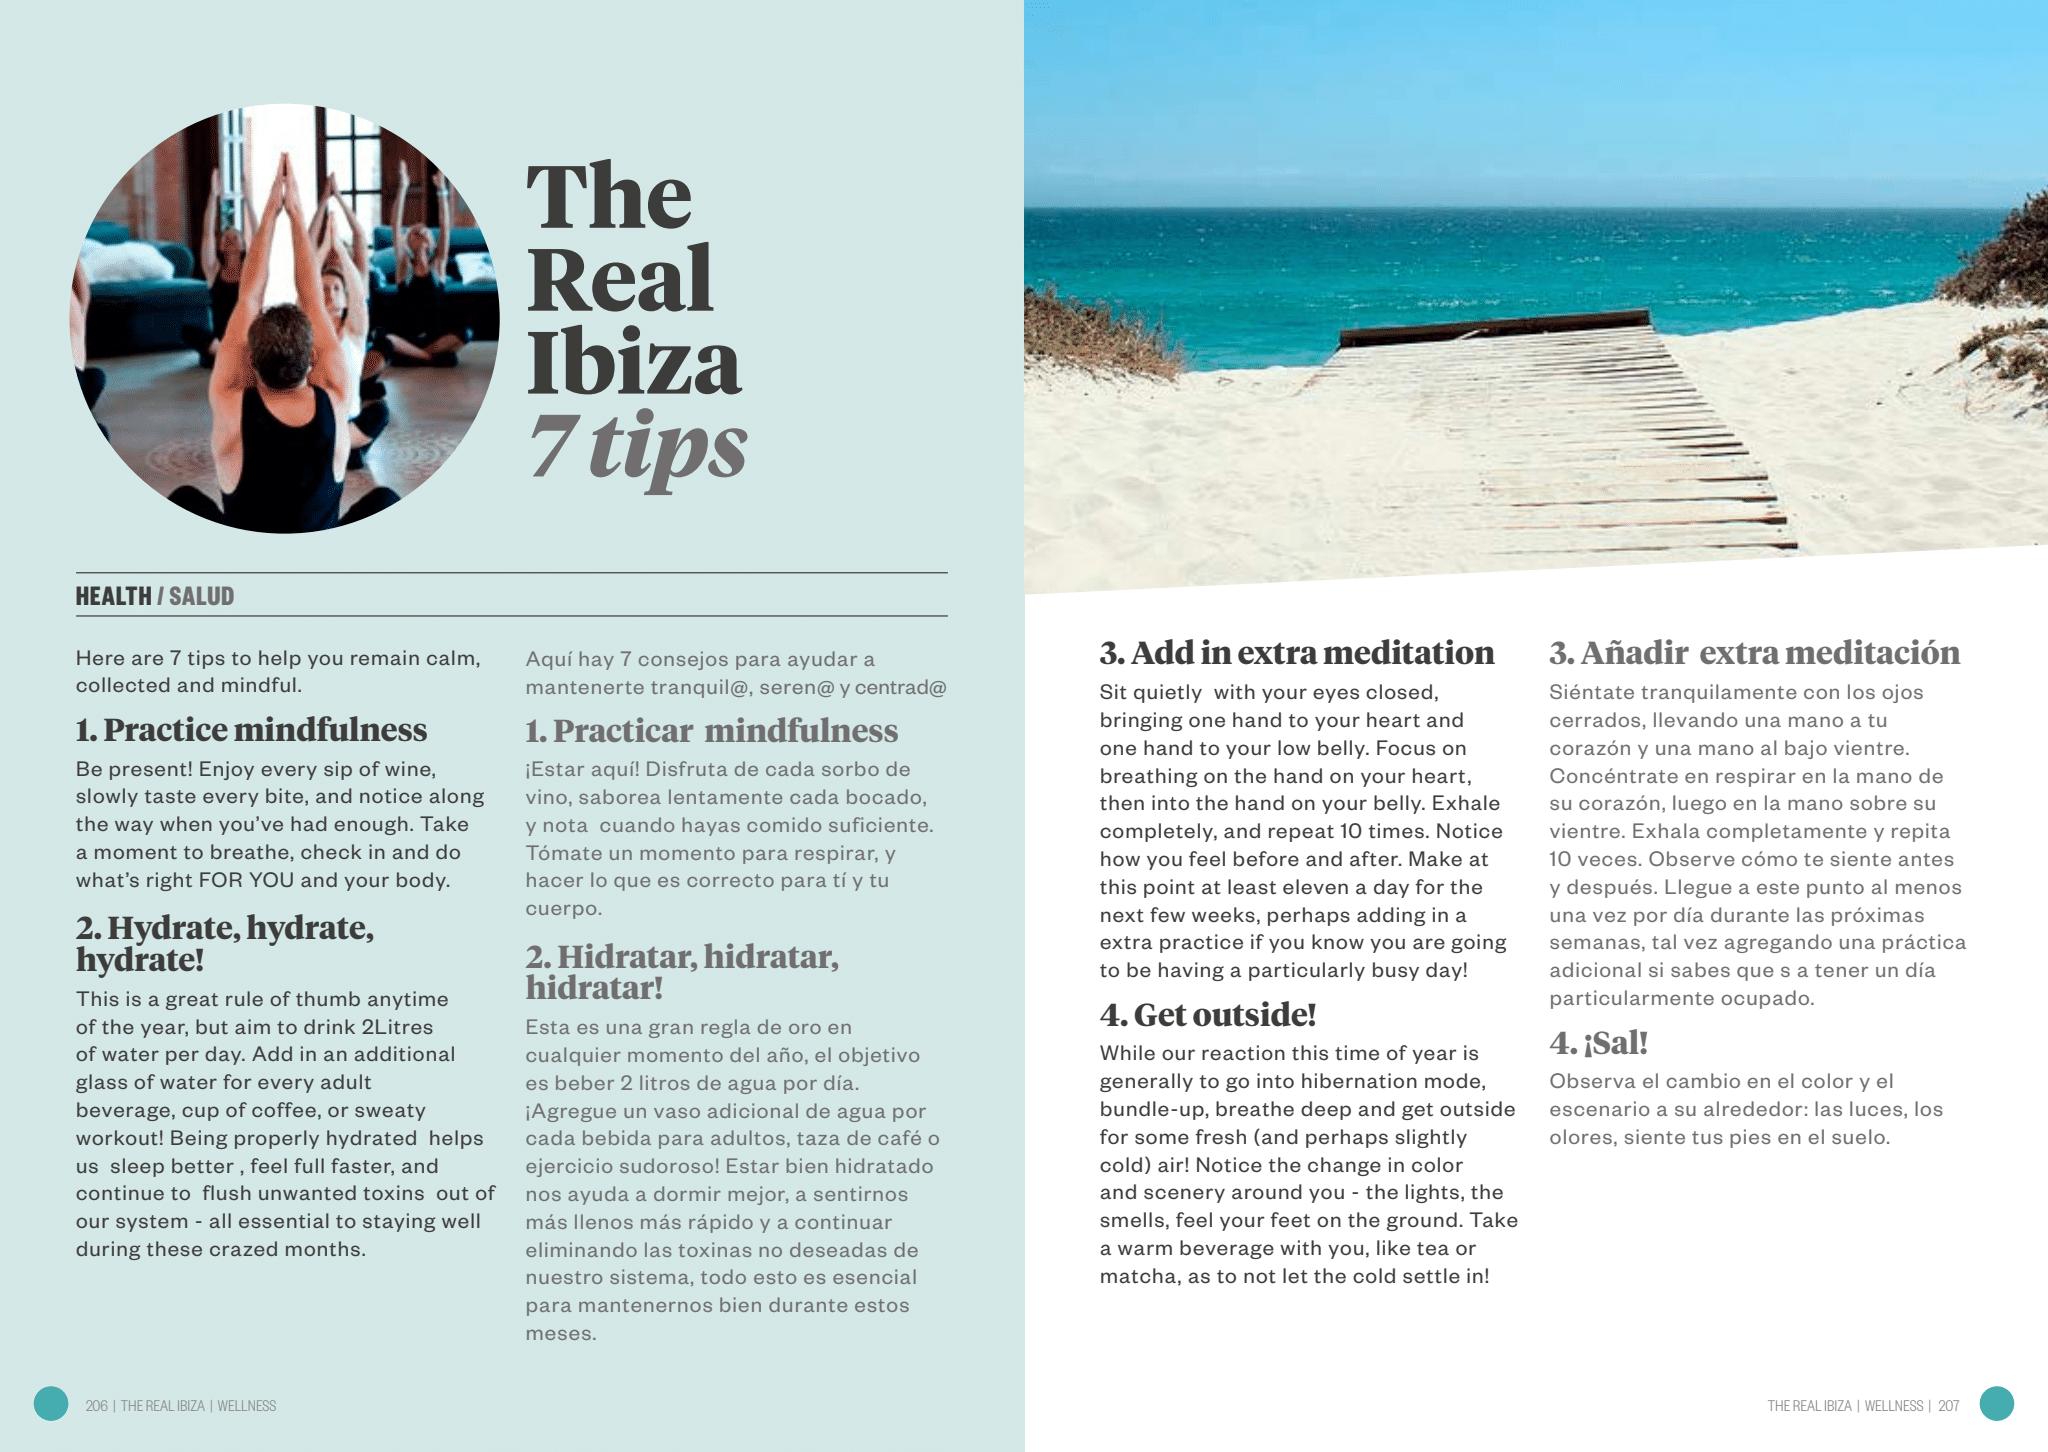 The Real ibiza. Wellness, 7 tips/Bienestar, 7 consejos